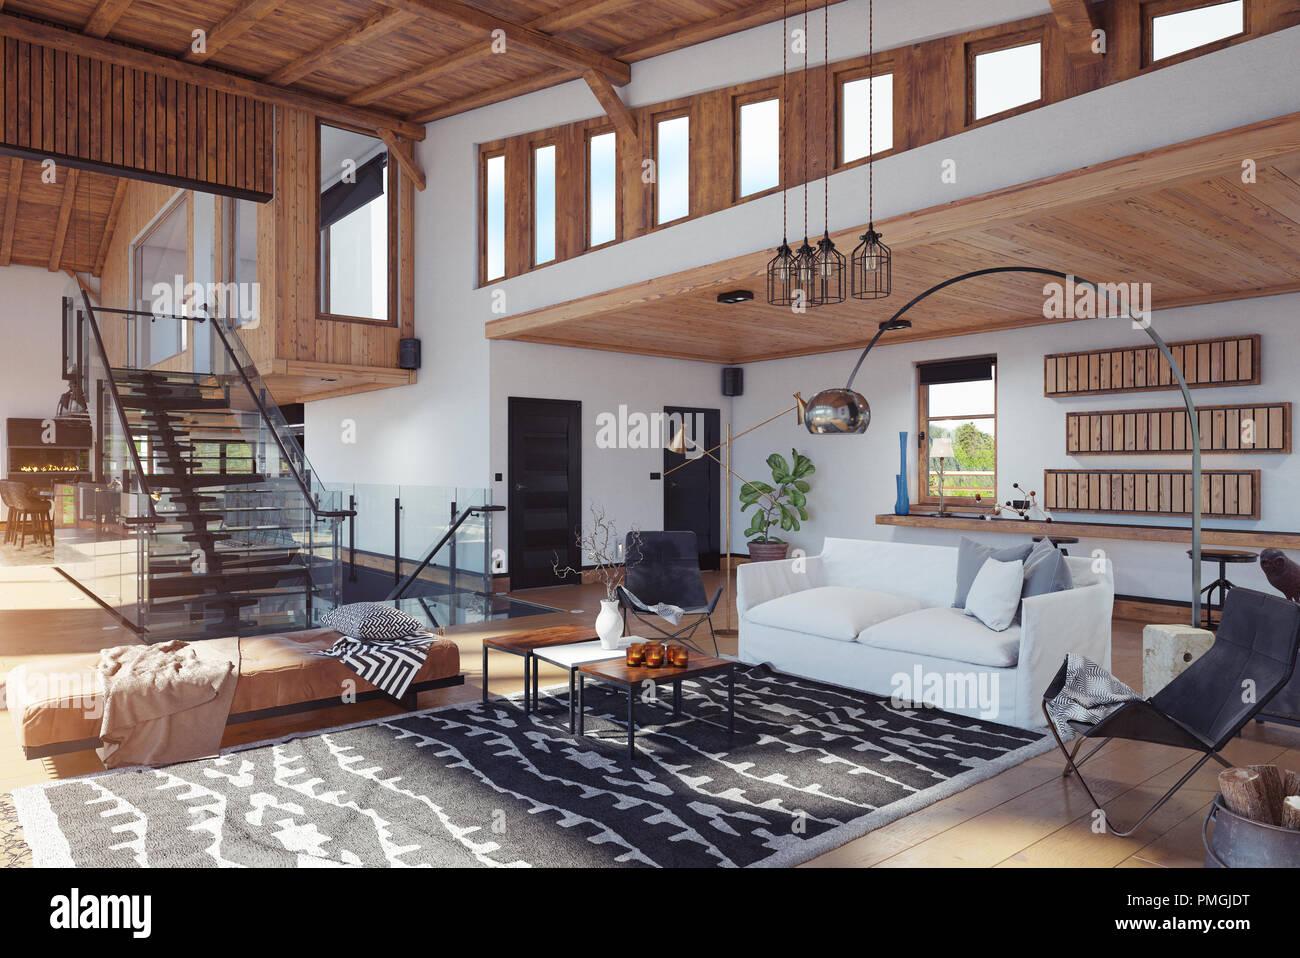 Modernes Chalet Interieur. 3D-rendering Design Konzept Stockfoto ...